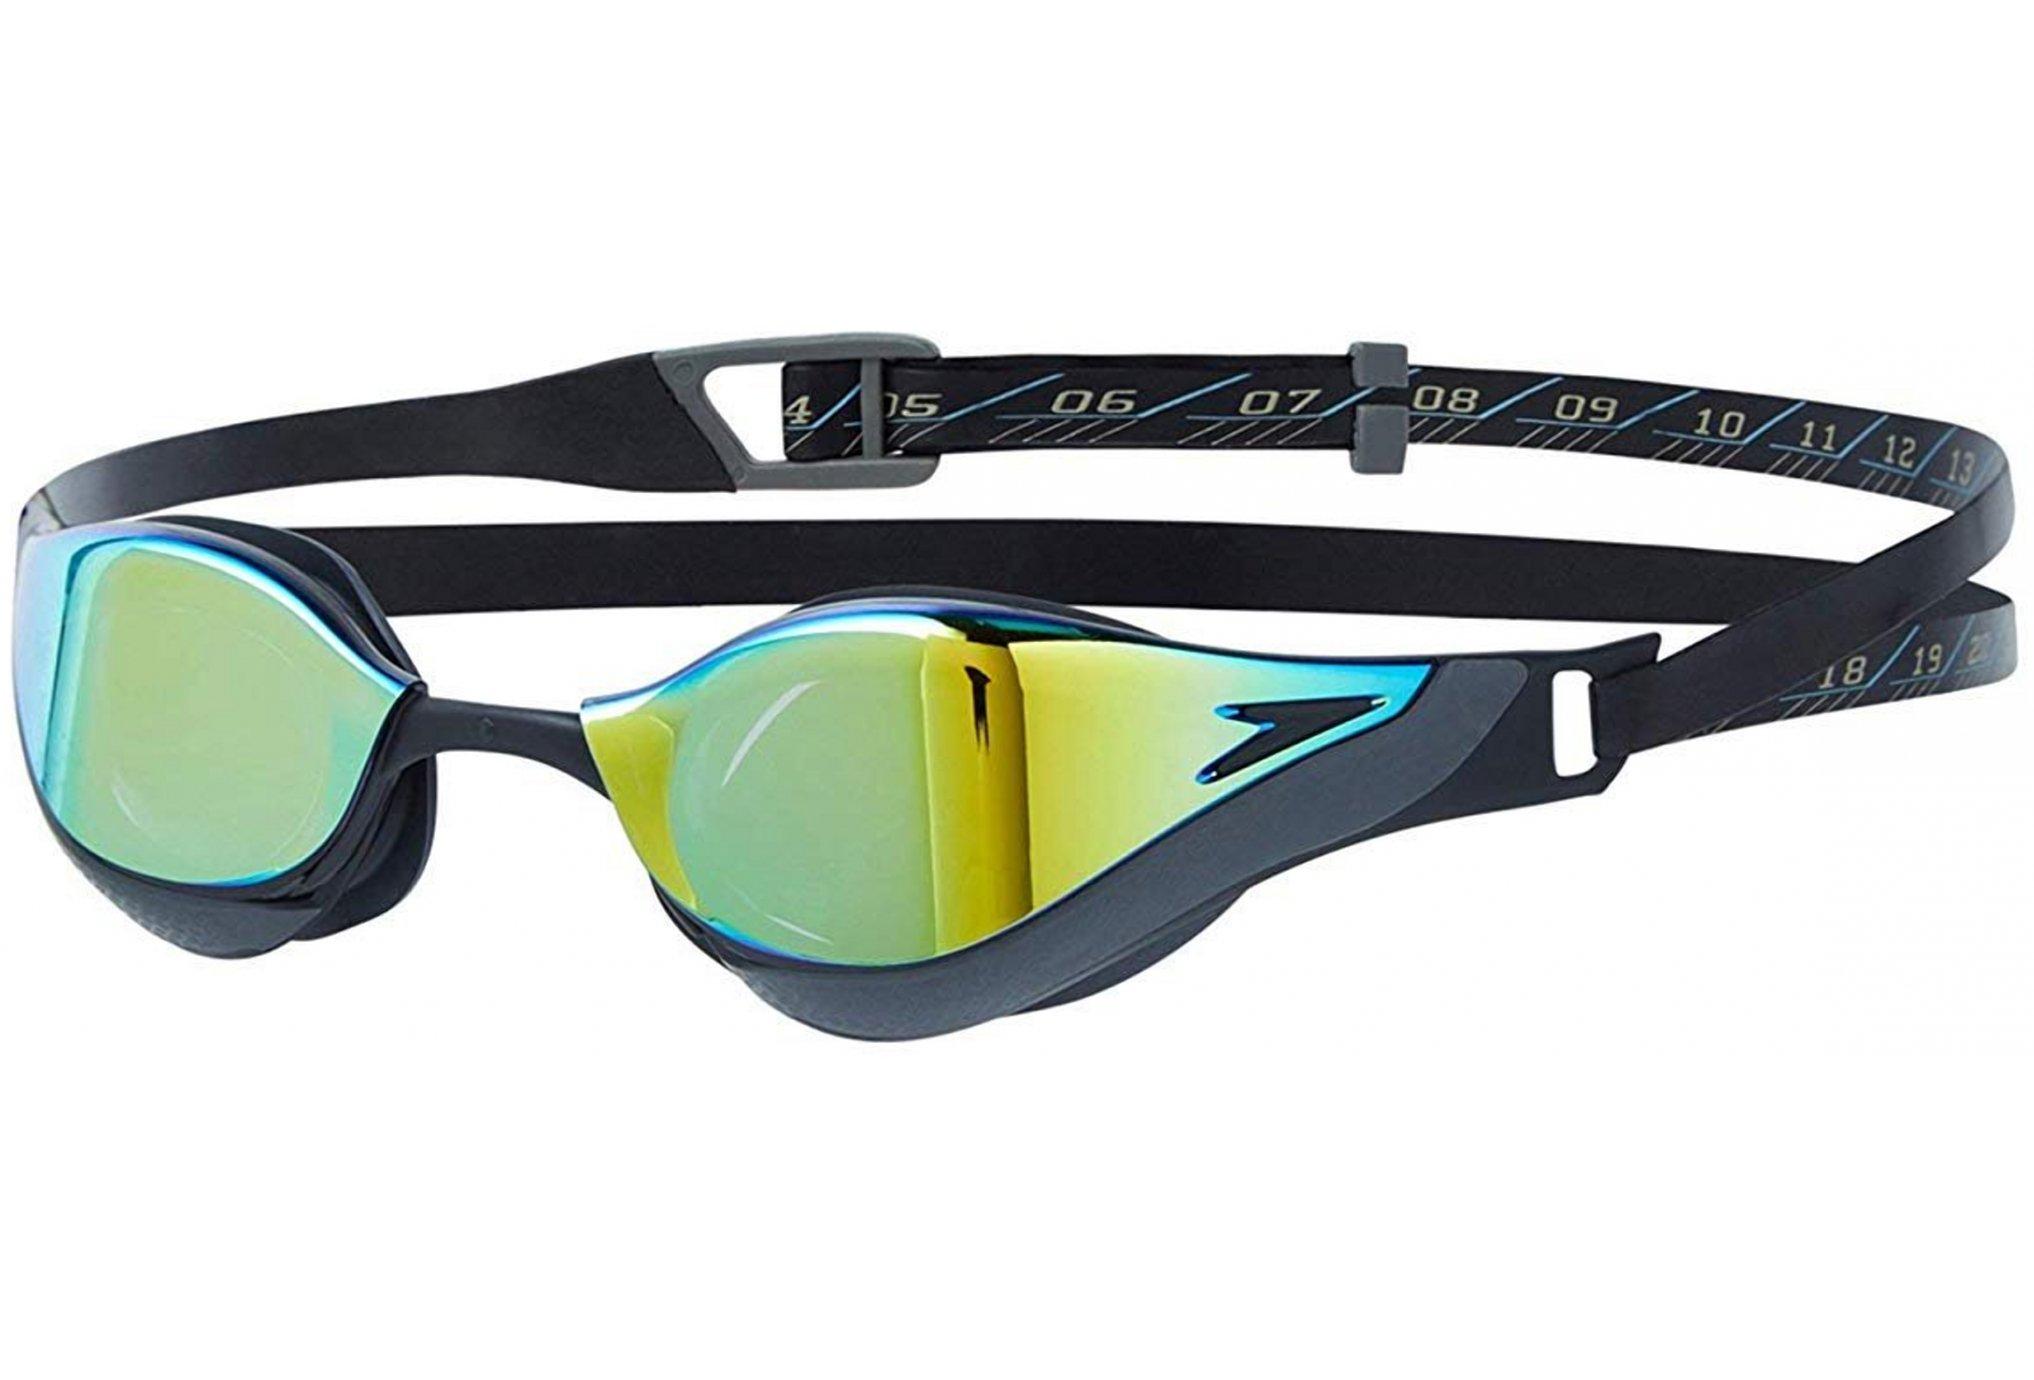 Speedo Fastskin Pure Focus Mirror Triathlon-Natation